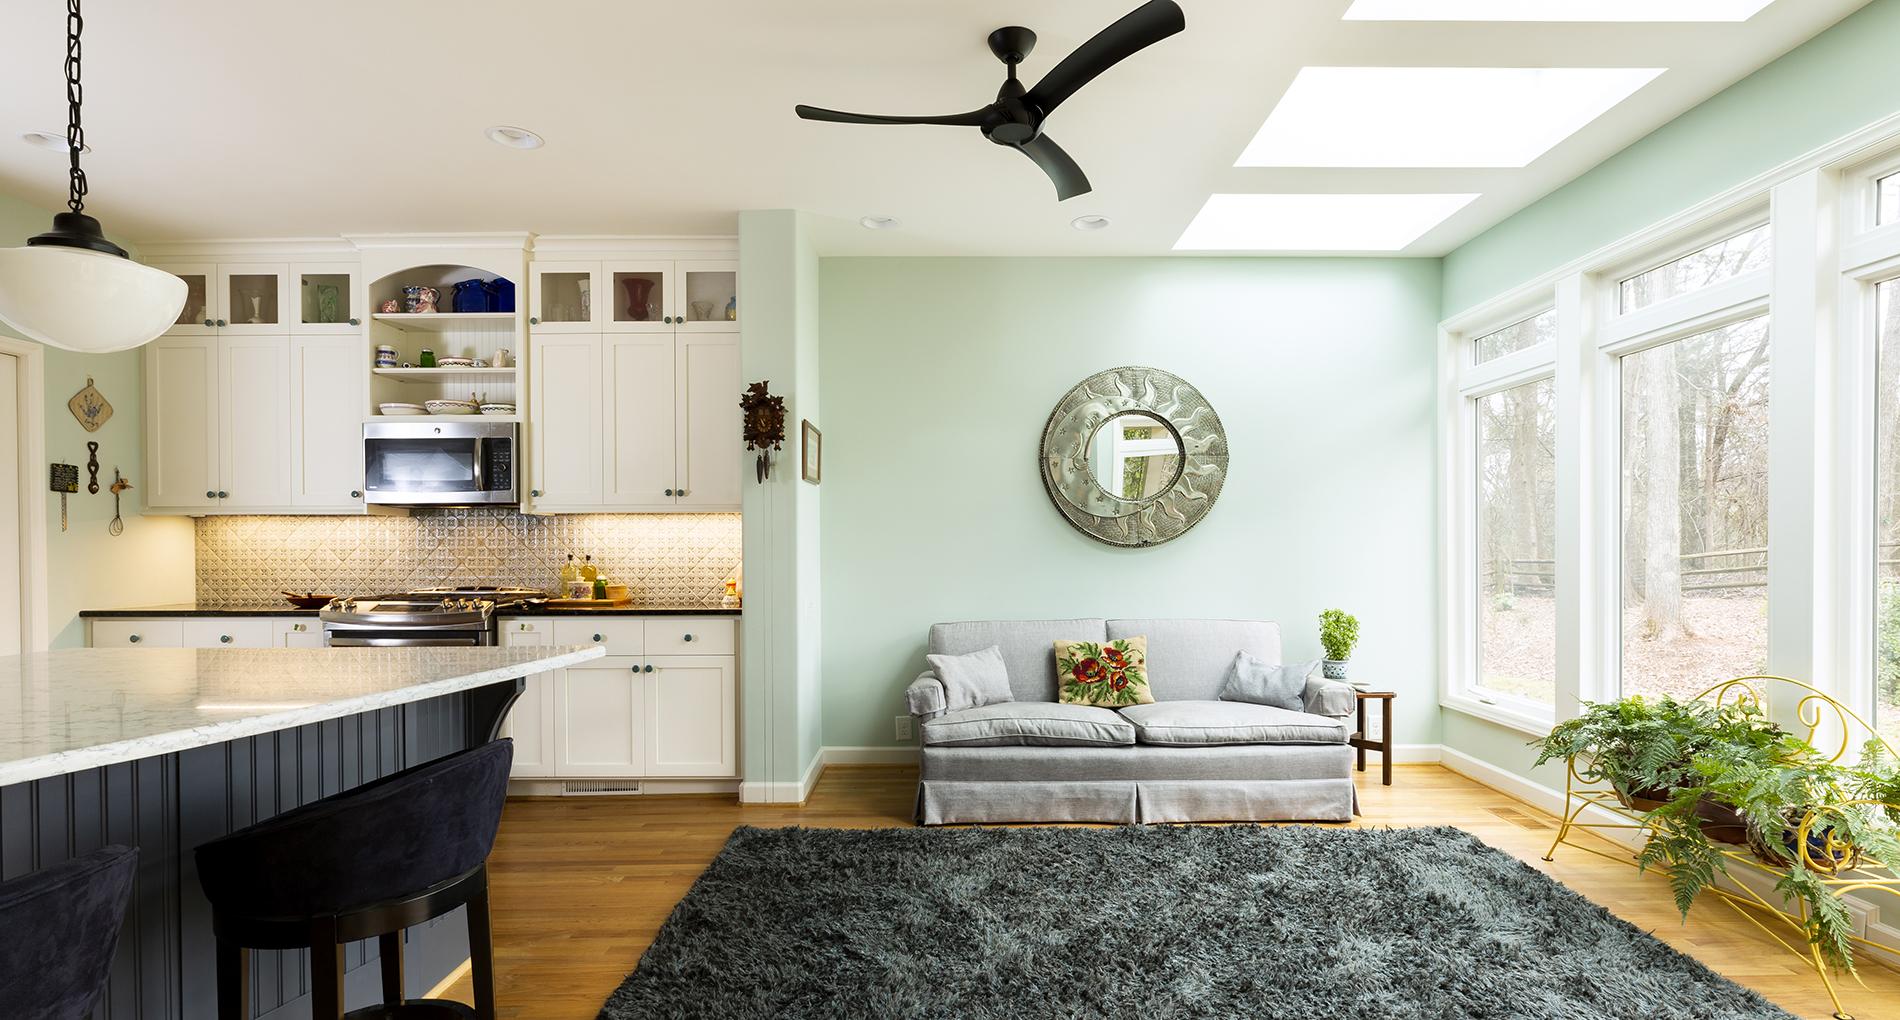 Stourbridge Kitchen Remodel and Addition